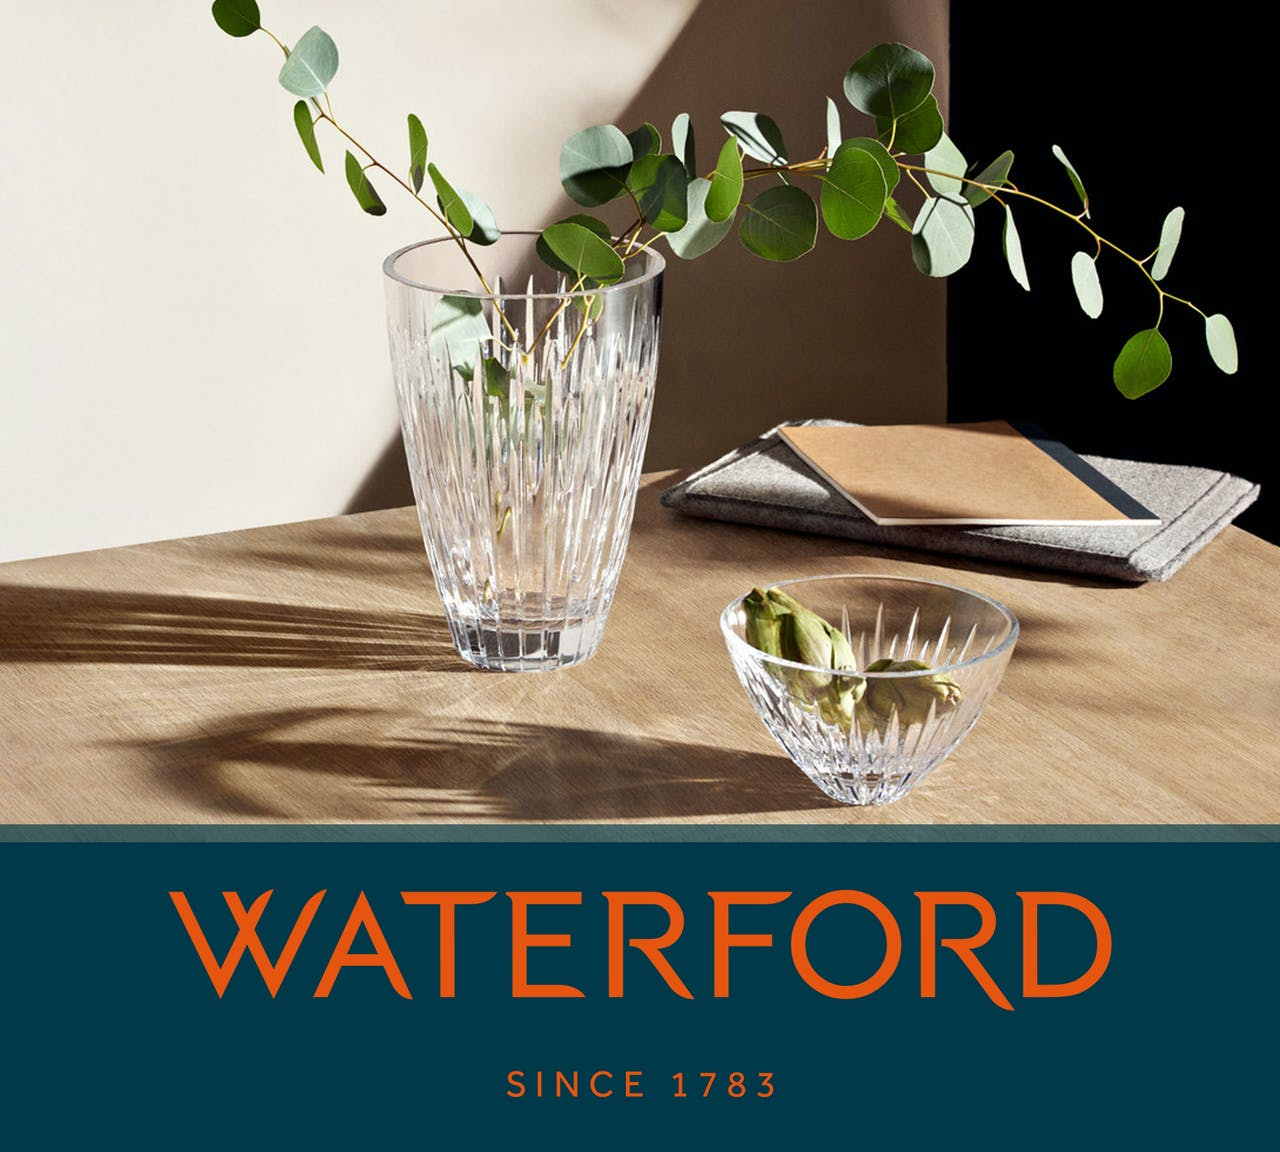 Shop Waterford Crystals Range of crystal bowls, Vases, Frames, barware and much more online at Kilkenny Shop